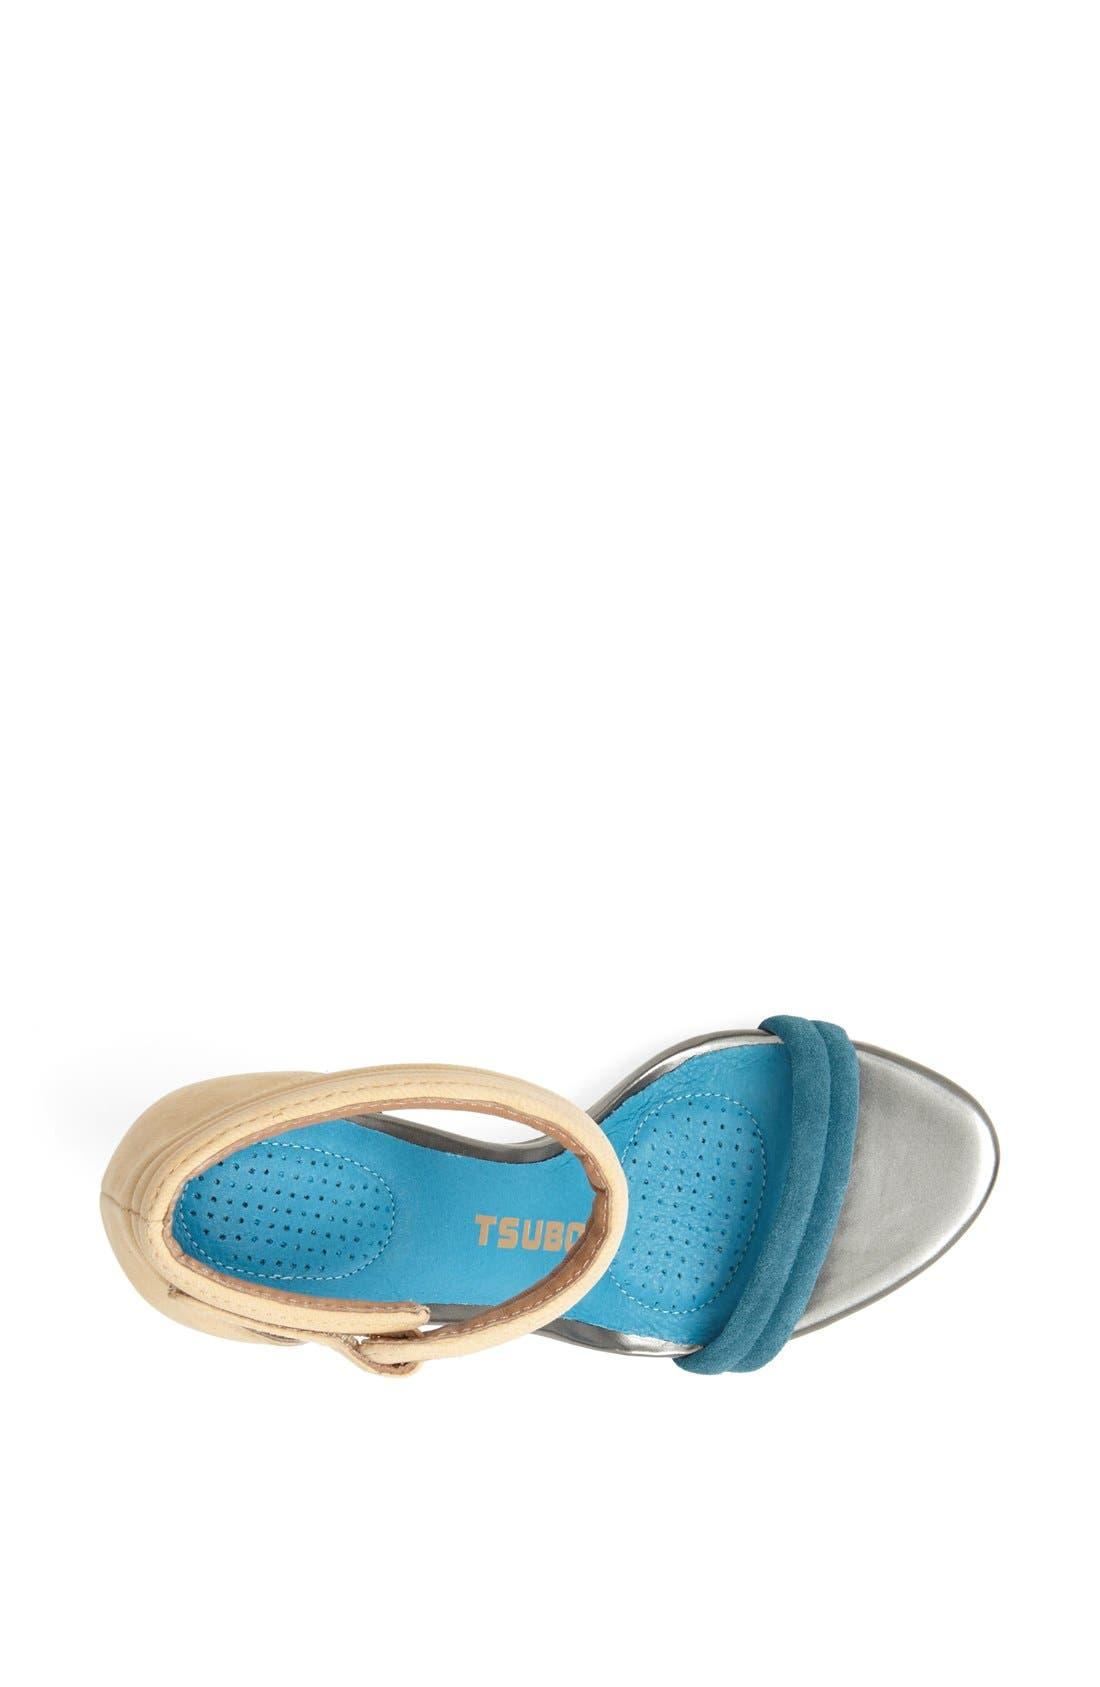 Alternate Image 3  - Tsubo 'Triss' Sandal